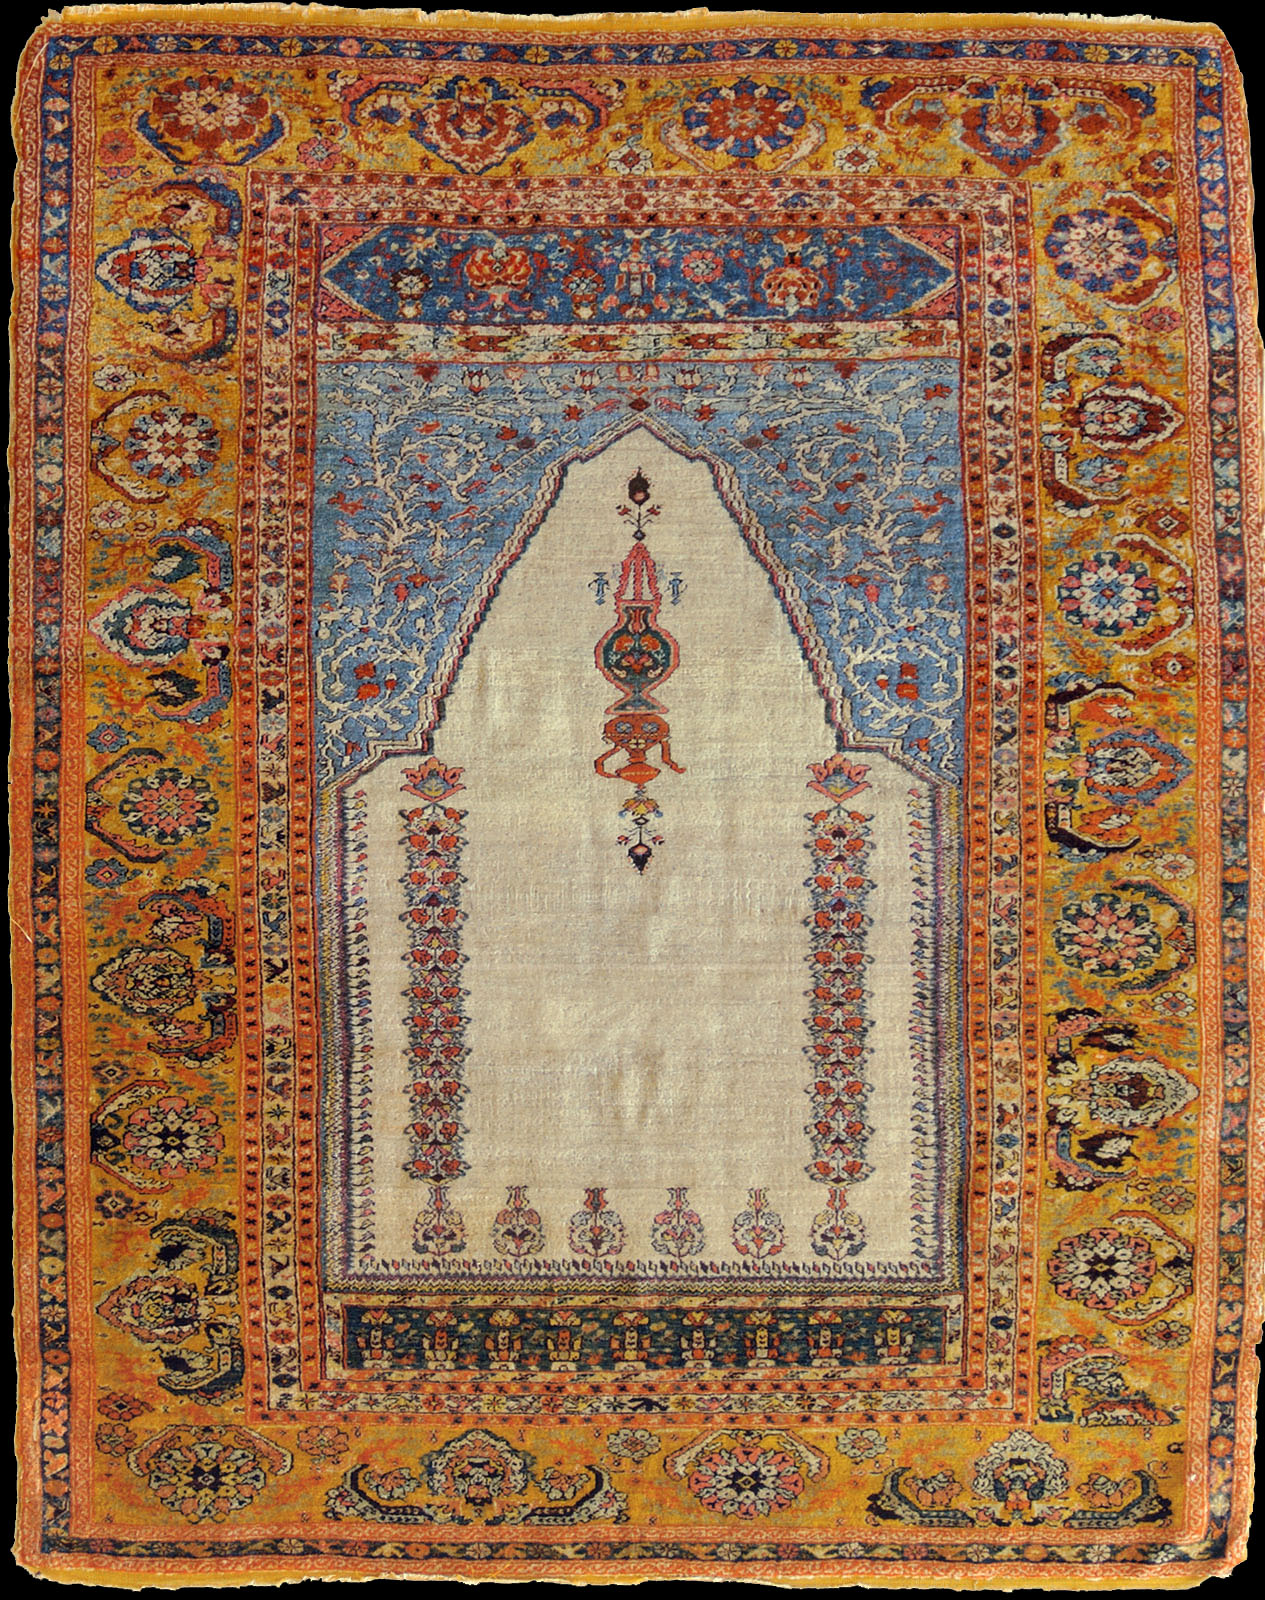 Bandırma workshop carpet, 18th century, Western Anatolia